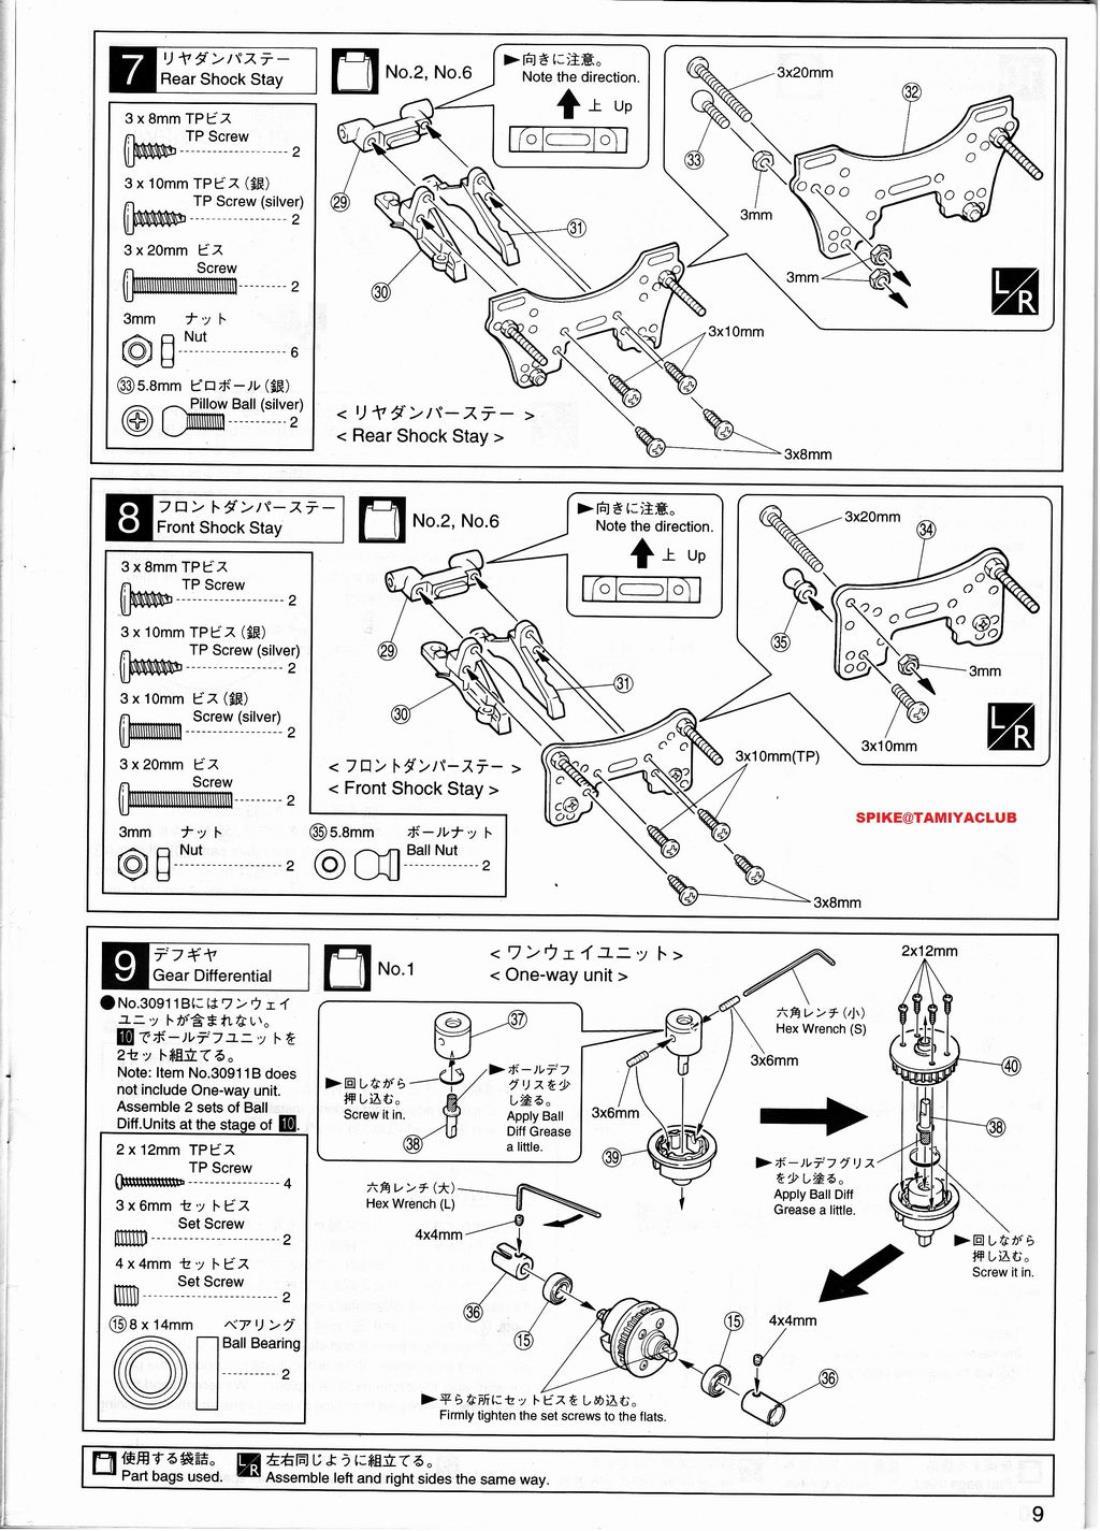 Kyosho From Spike Showroom Kyosho Tf 4 R Manual